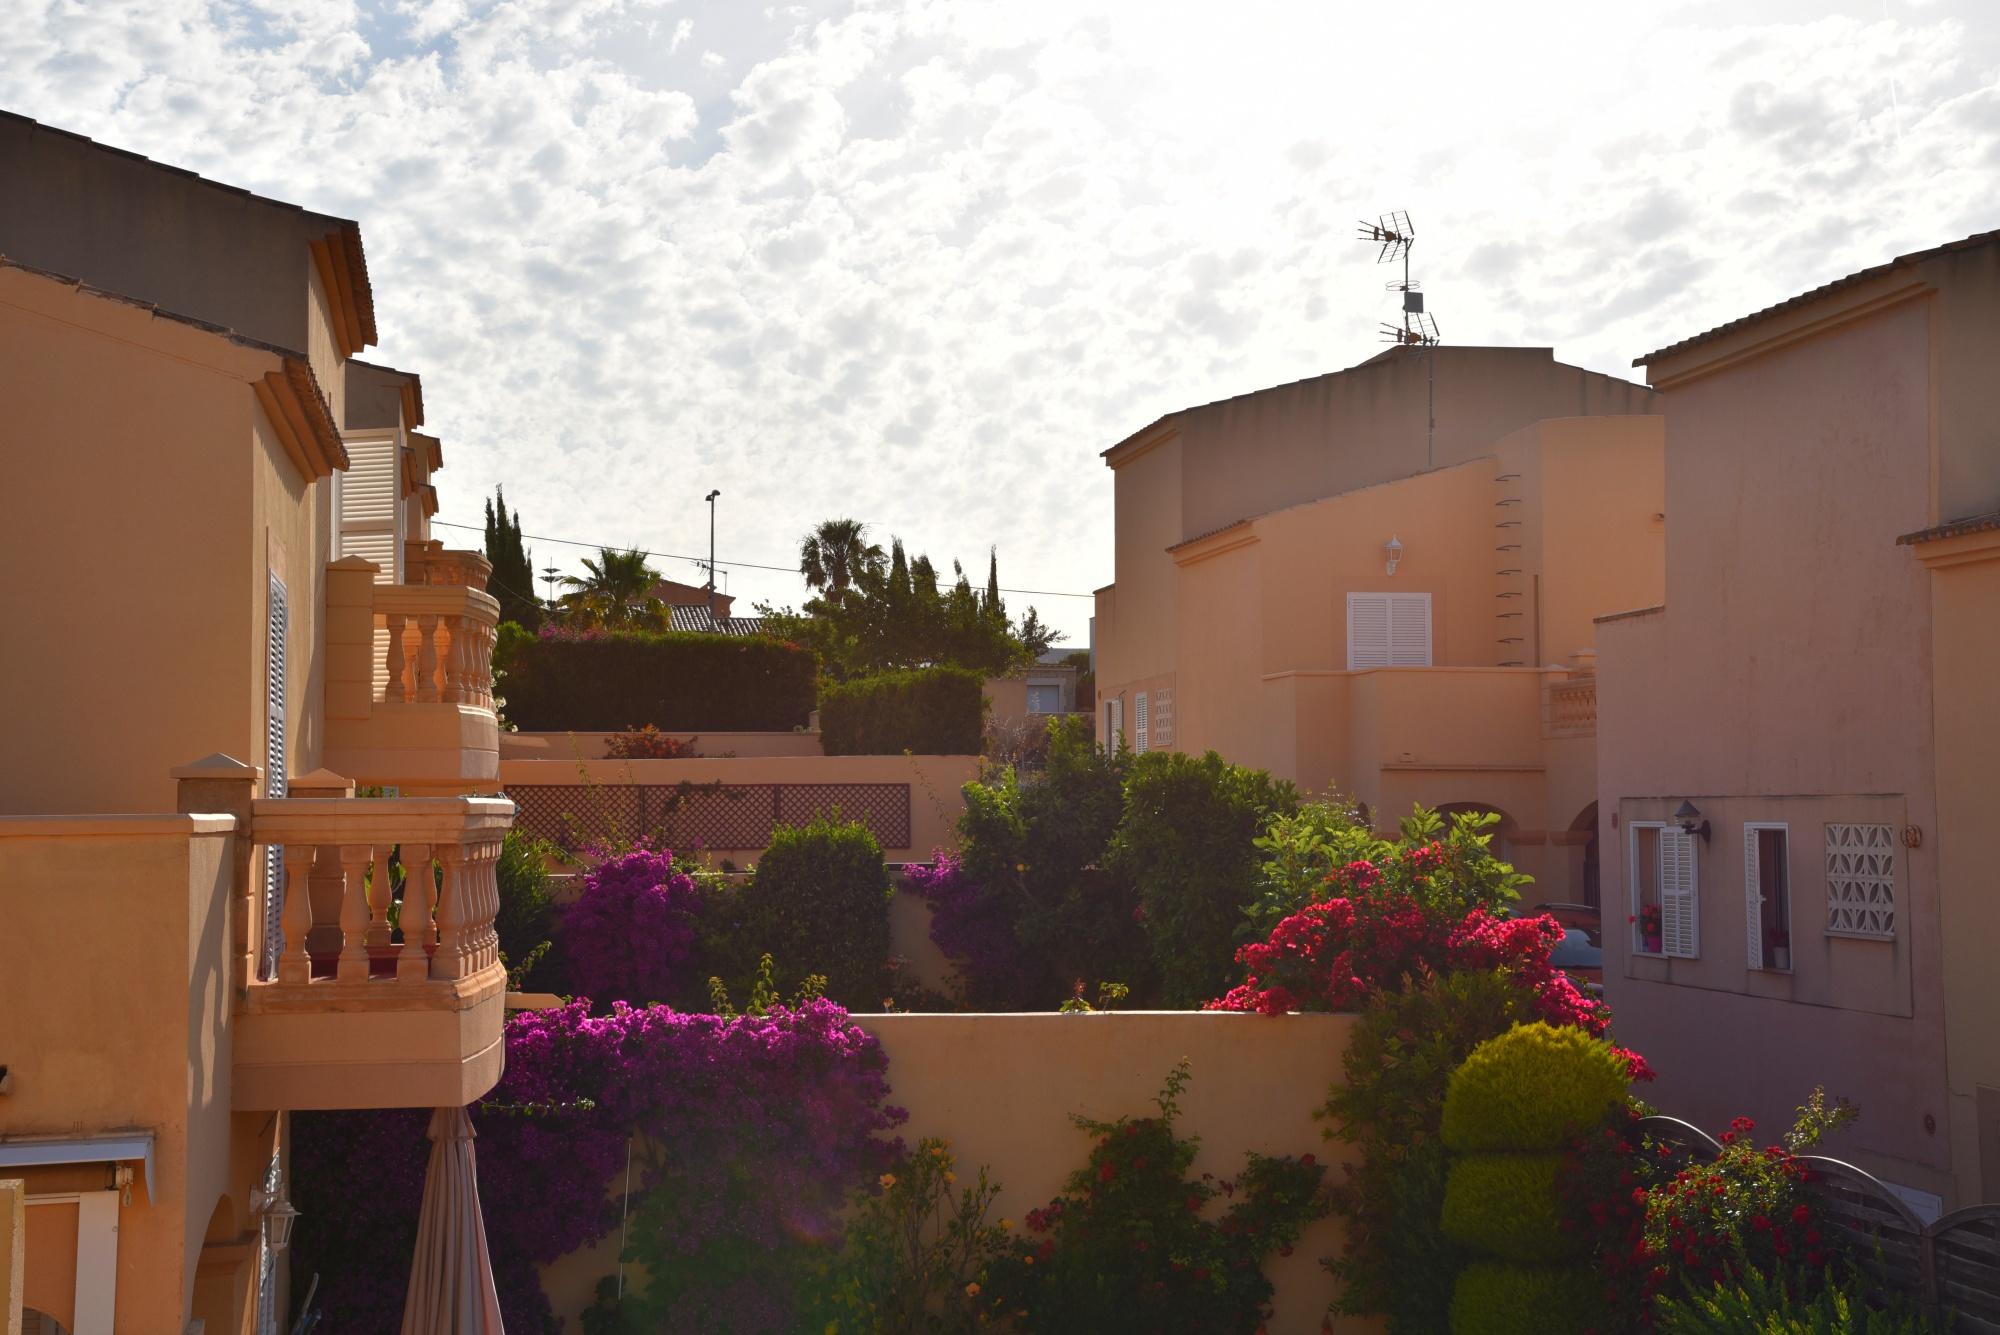 Ferienhaus Mallorca, Ferienwohnung Mallorca, FeWo direkt